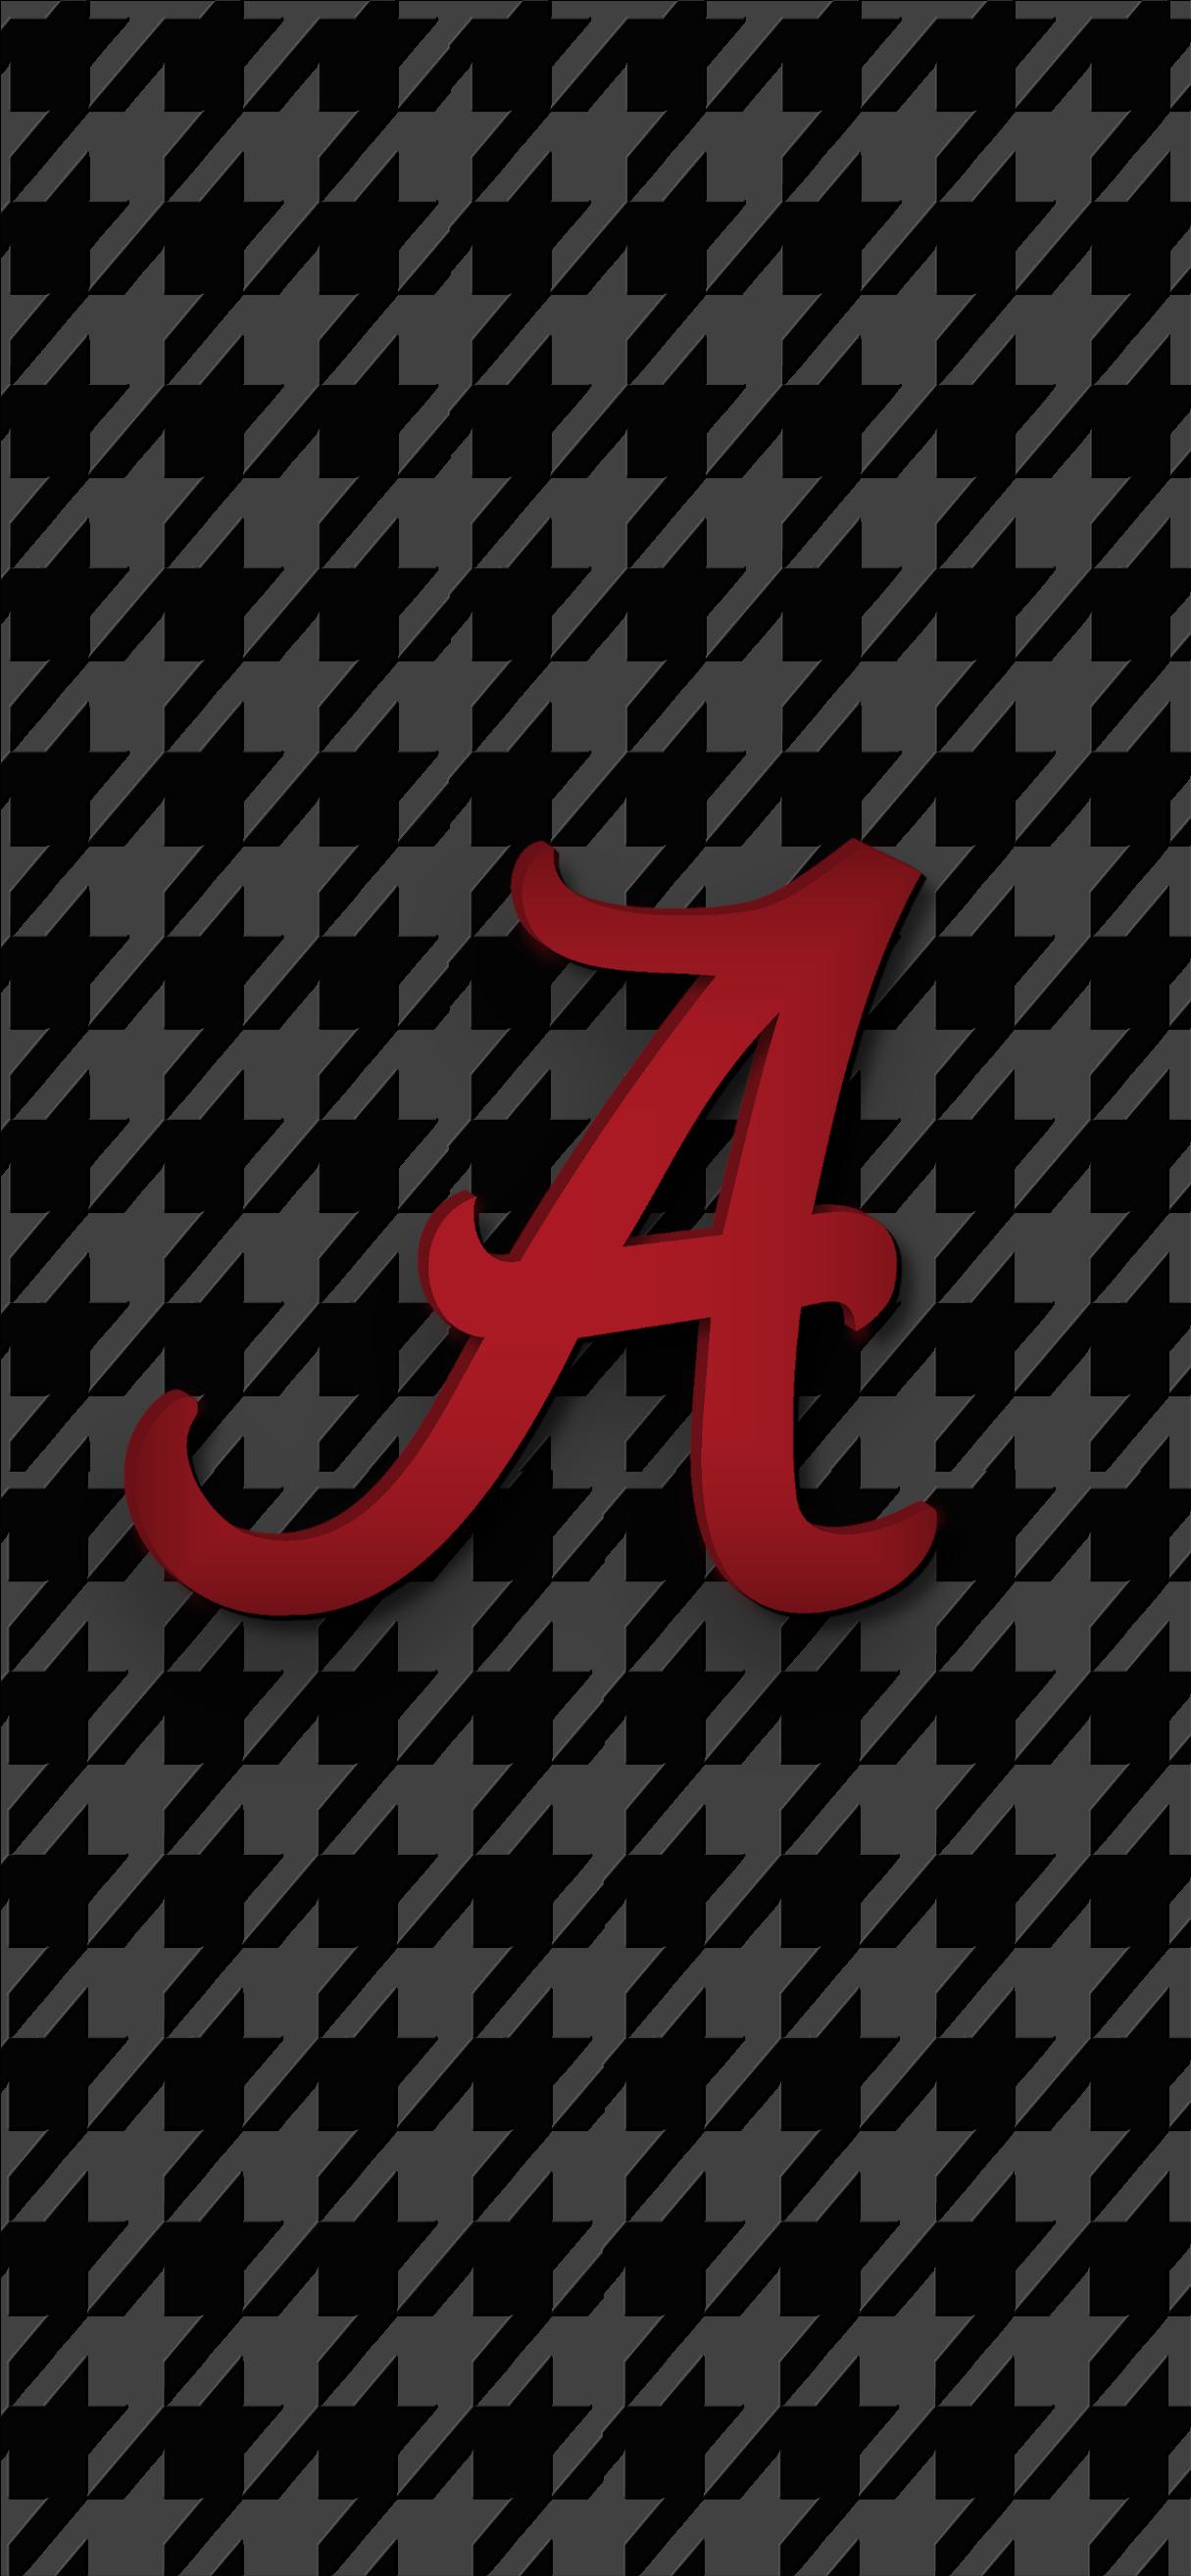 Alabama Crimson Tide Football Logo Iphone Wallpaper In 2020